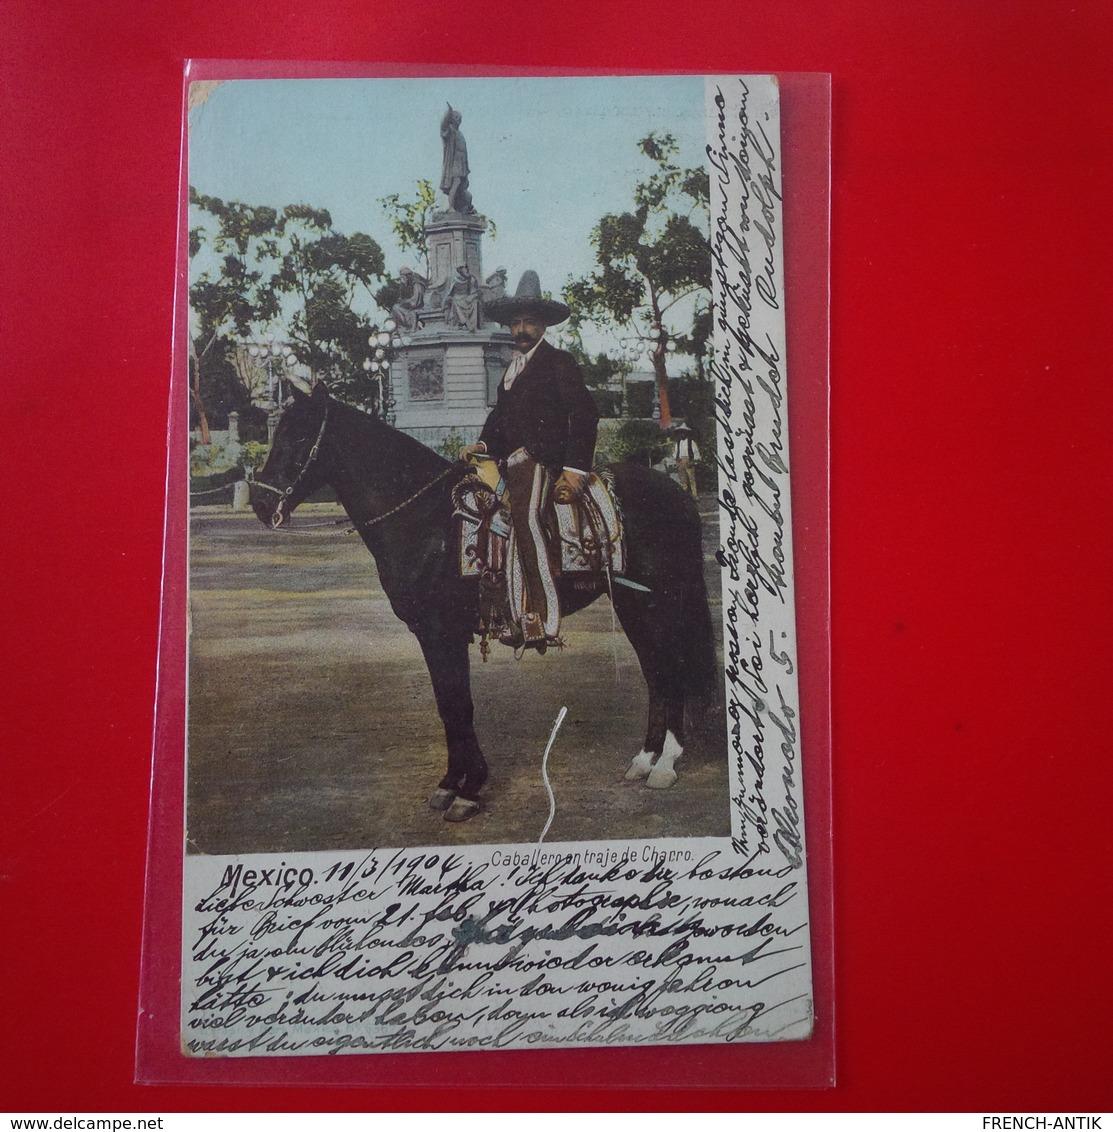 MEXICO CABALLERO EN TRAJE DE CHARRO - Mexico